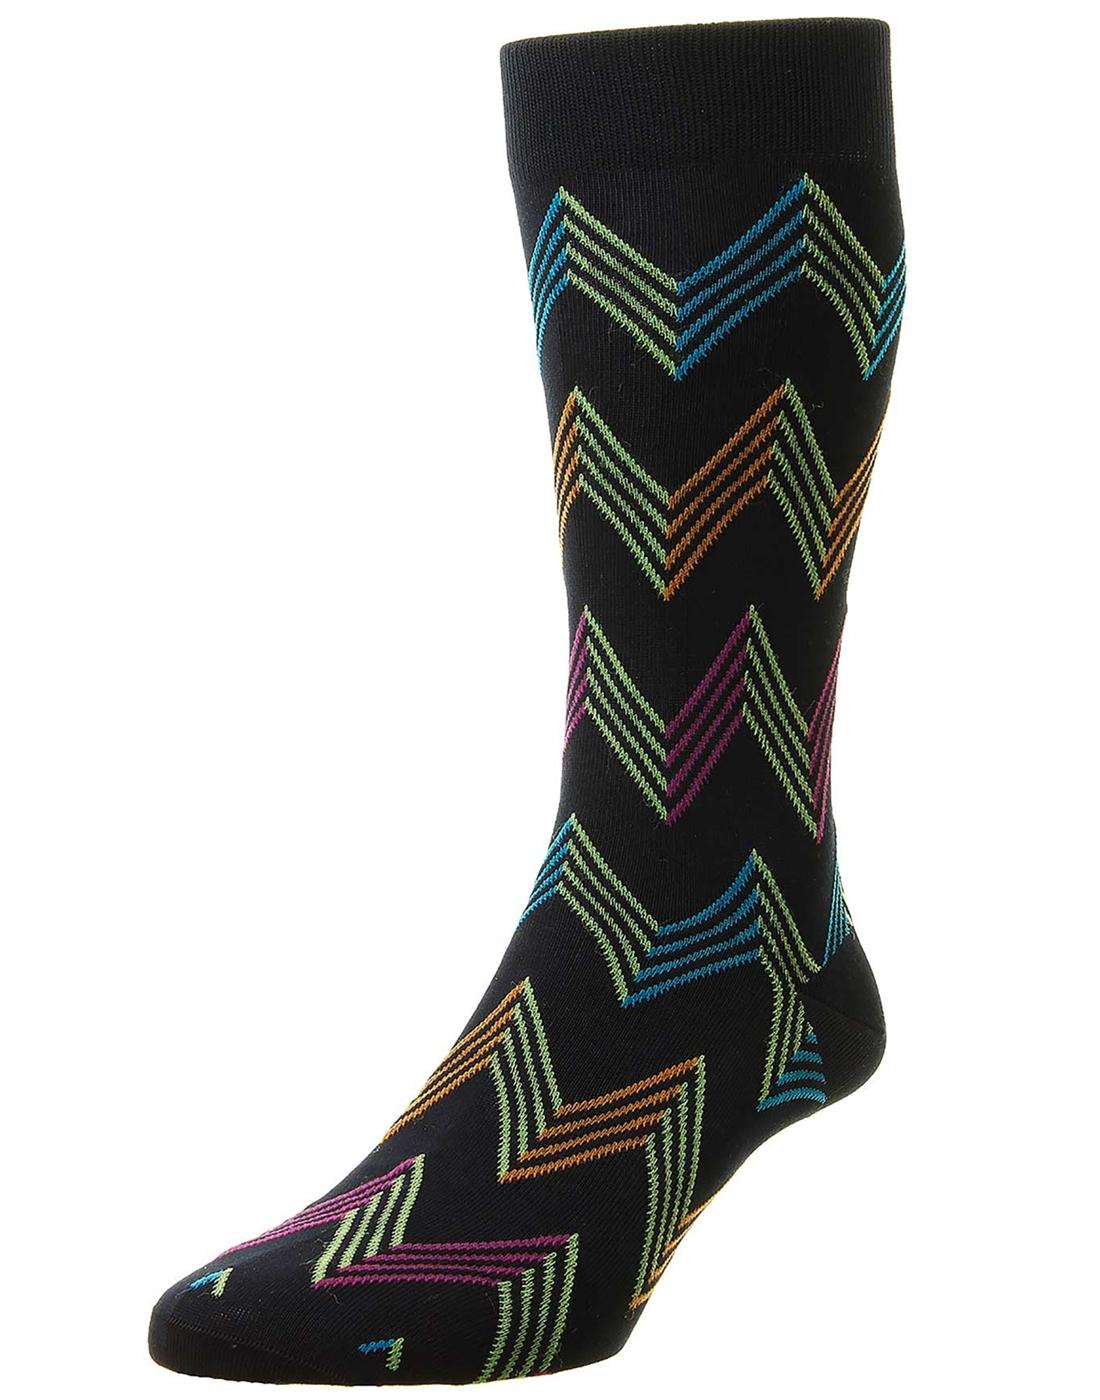 + Yasawa PANTHERELLA Men's Mod Zig Zag Socks N